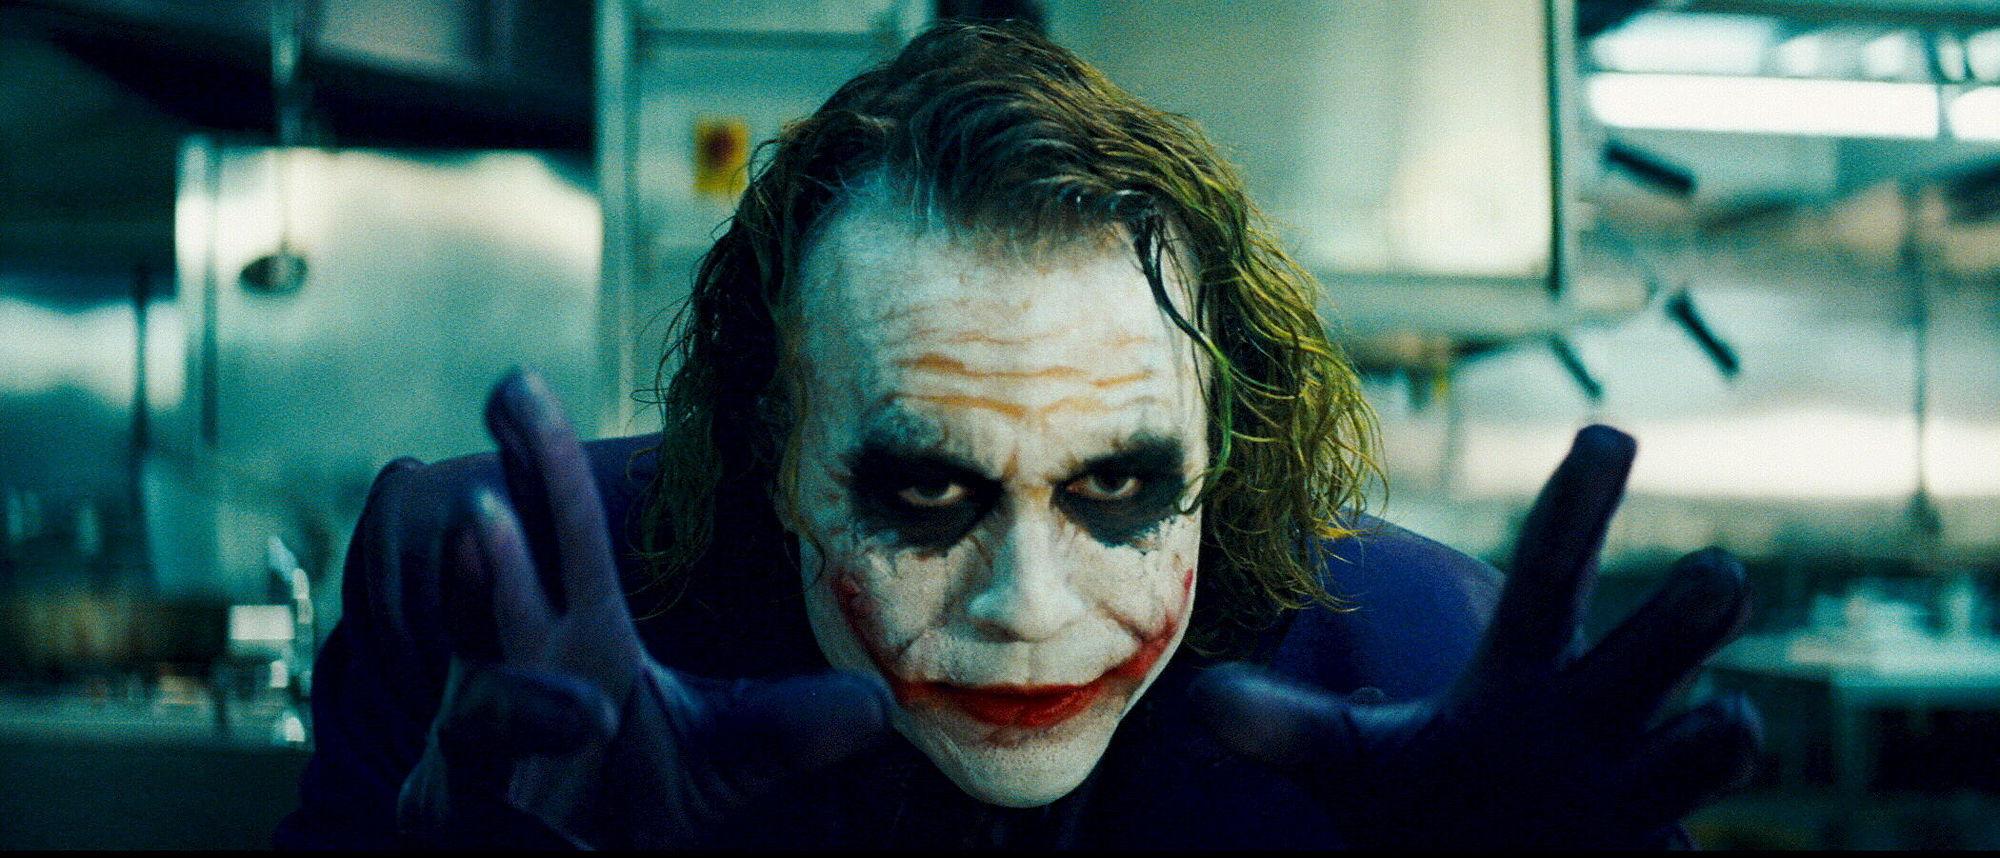 Heath Ledger as the Joker (2008)